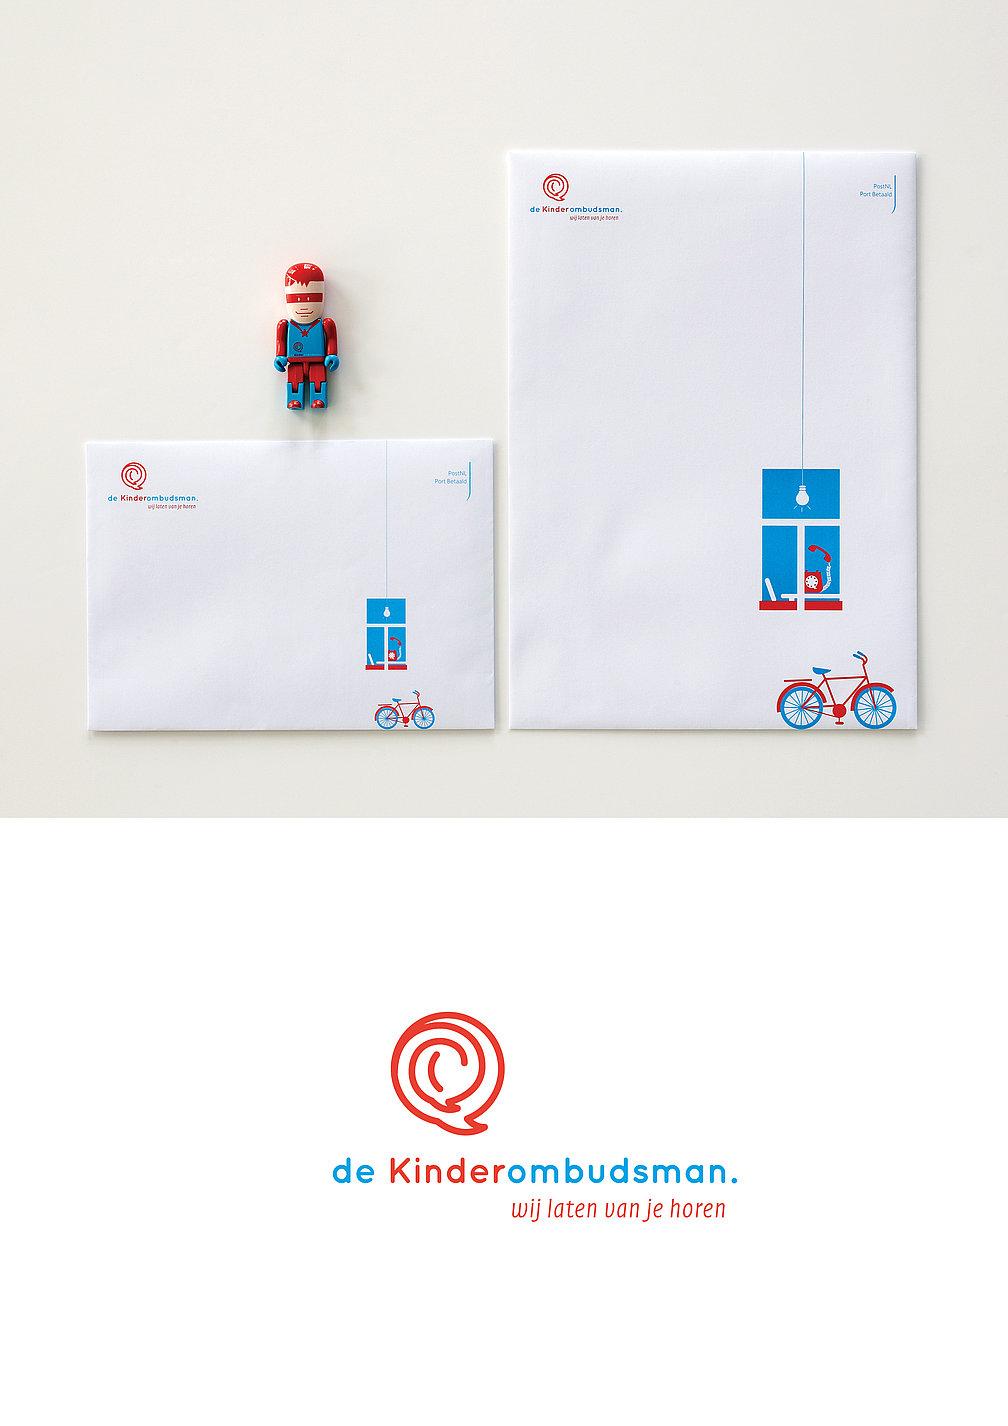 Dutch Children's  Ombudsman | Red Dot Design Award